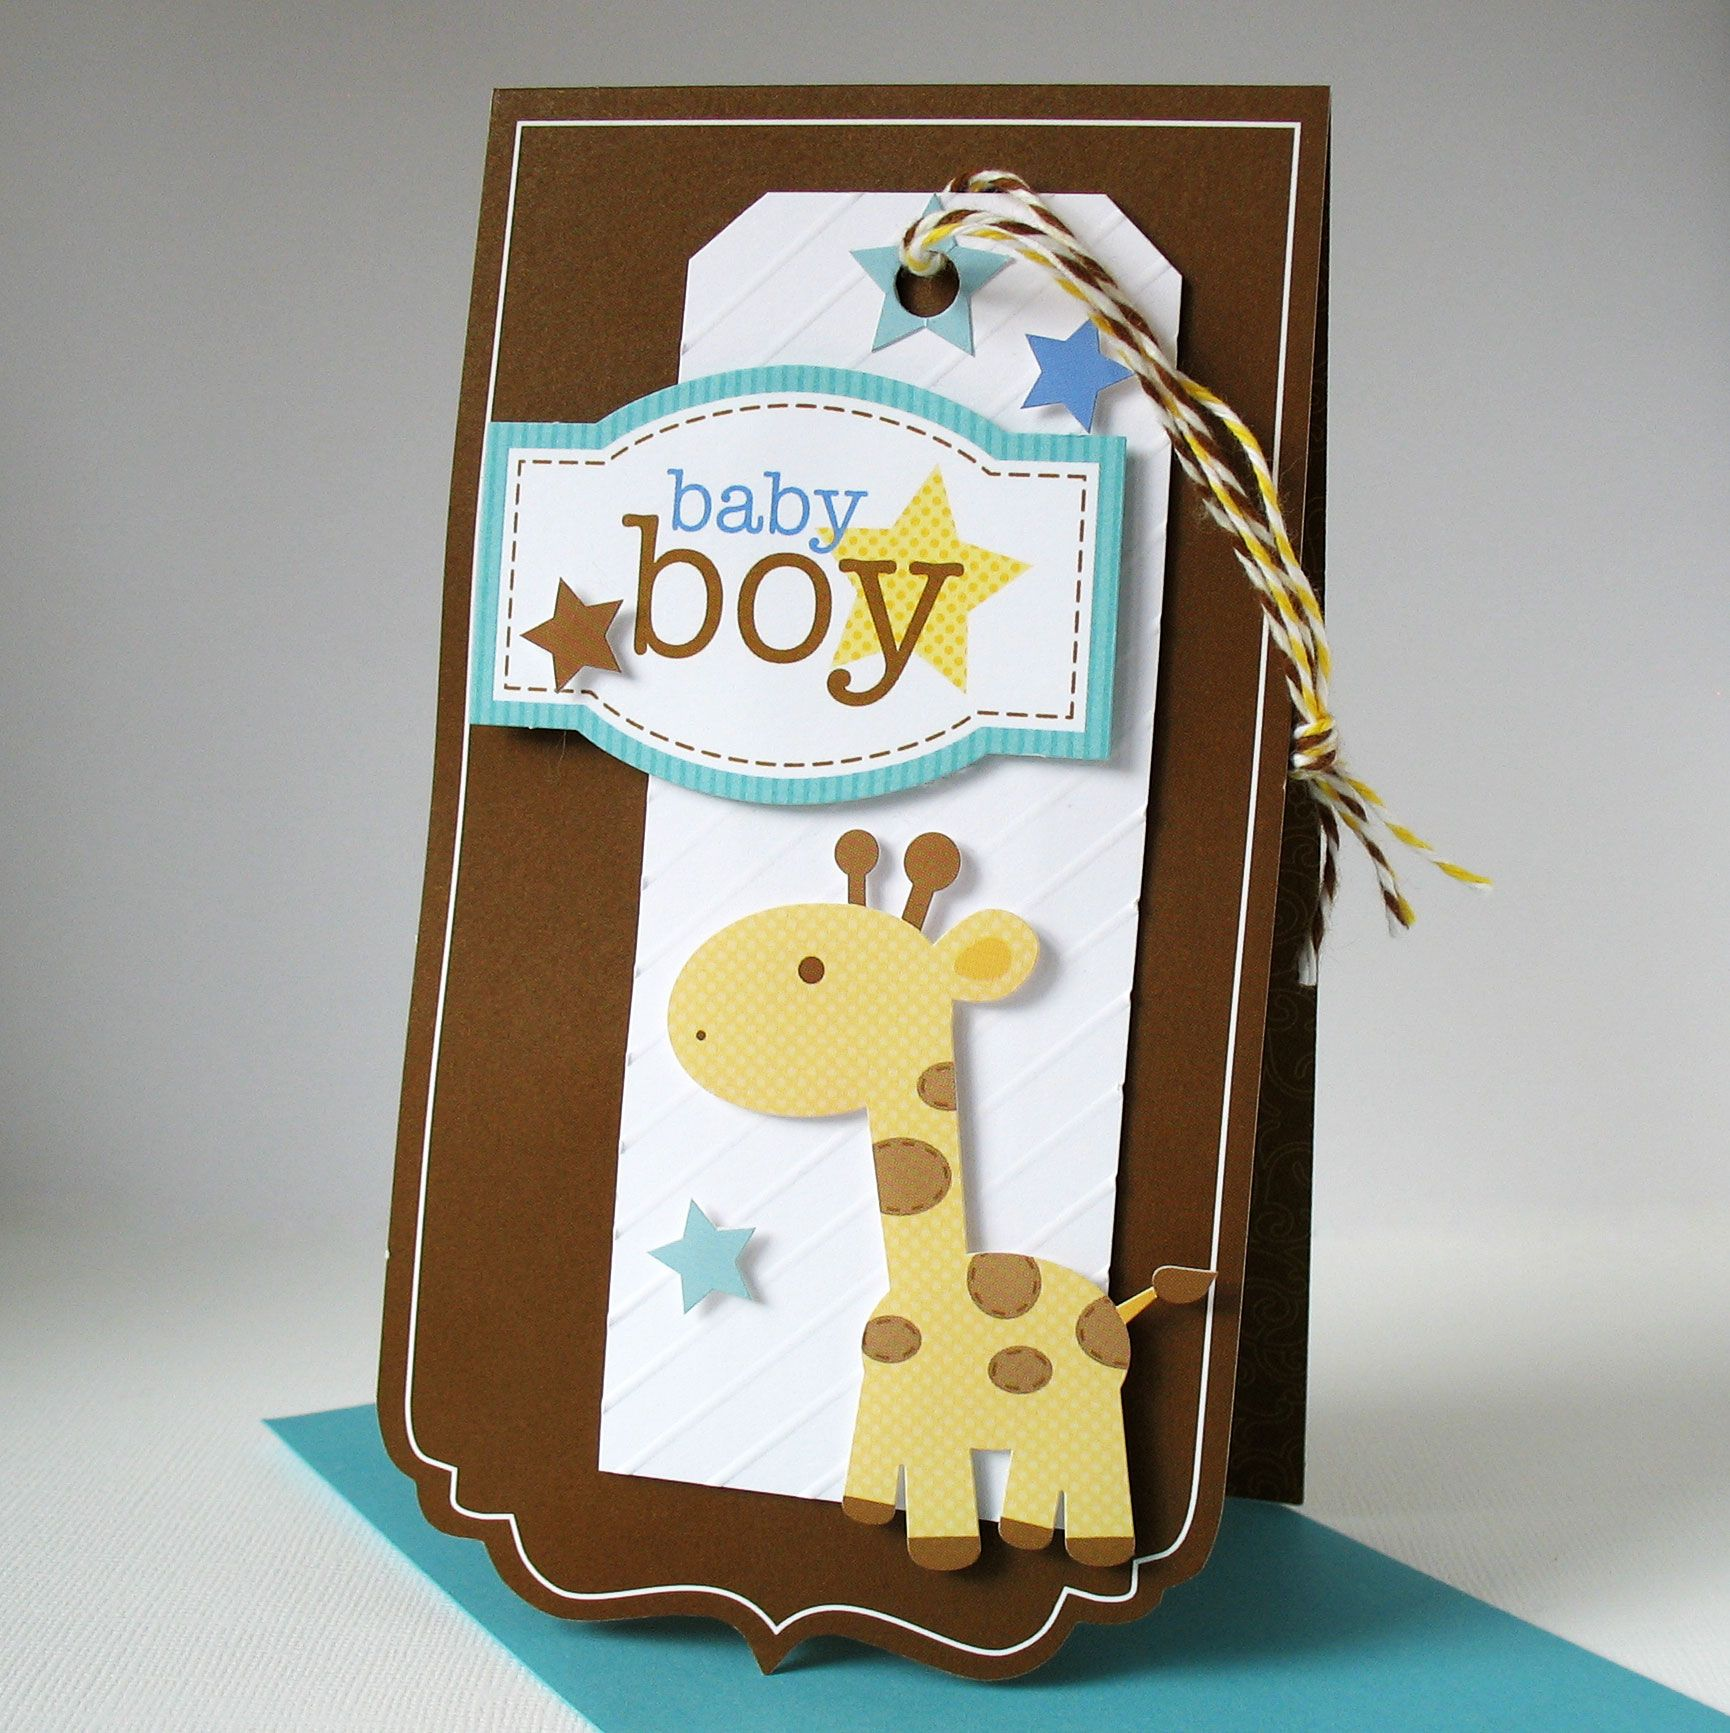 Baby scrapbook ideas on pinterest - Baby Boy Doodlebug Scrapbook Com